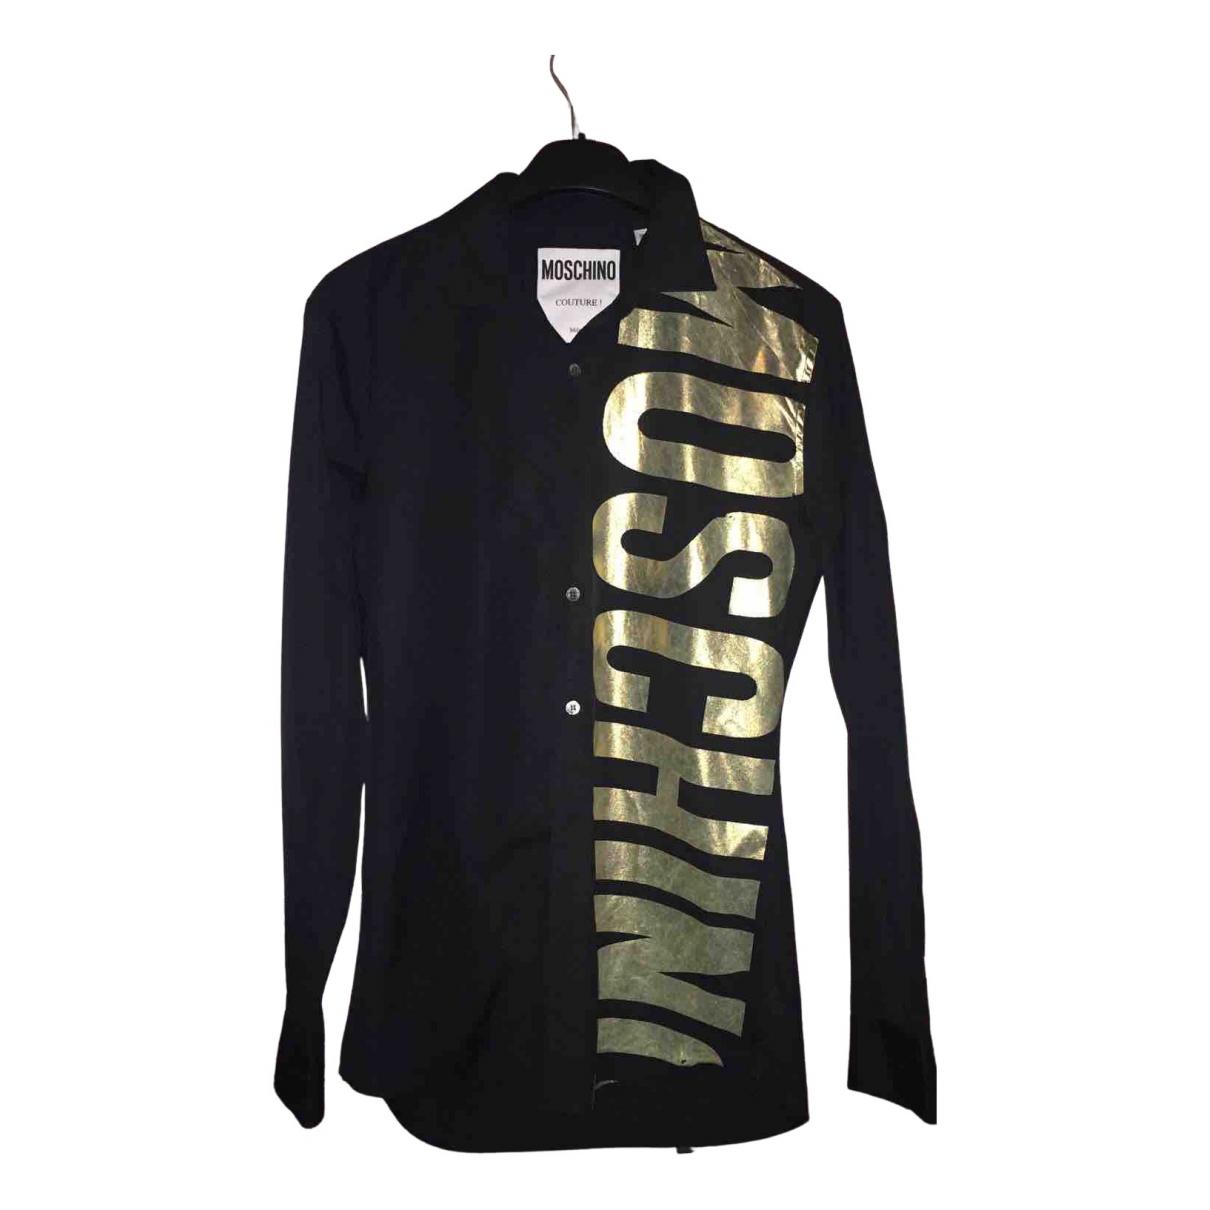 Moschino \N Black Cotton Shirts for Men M International